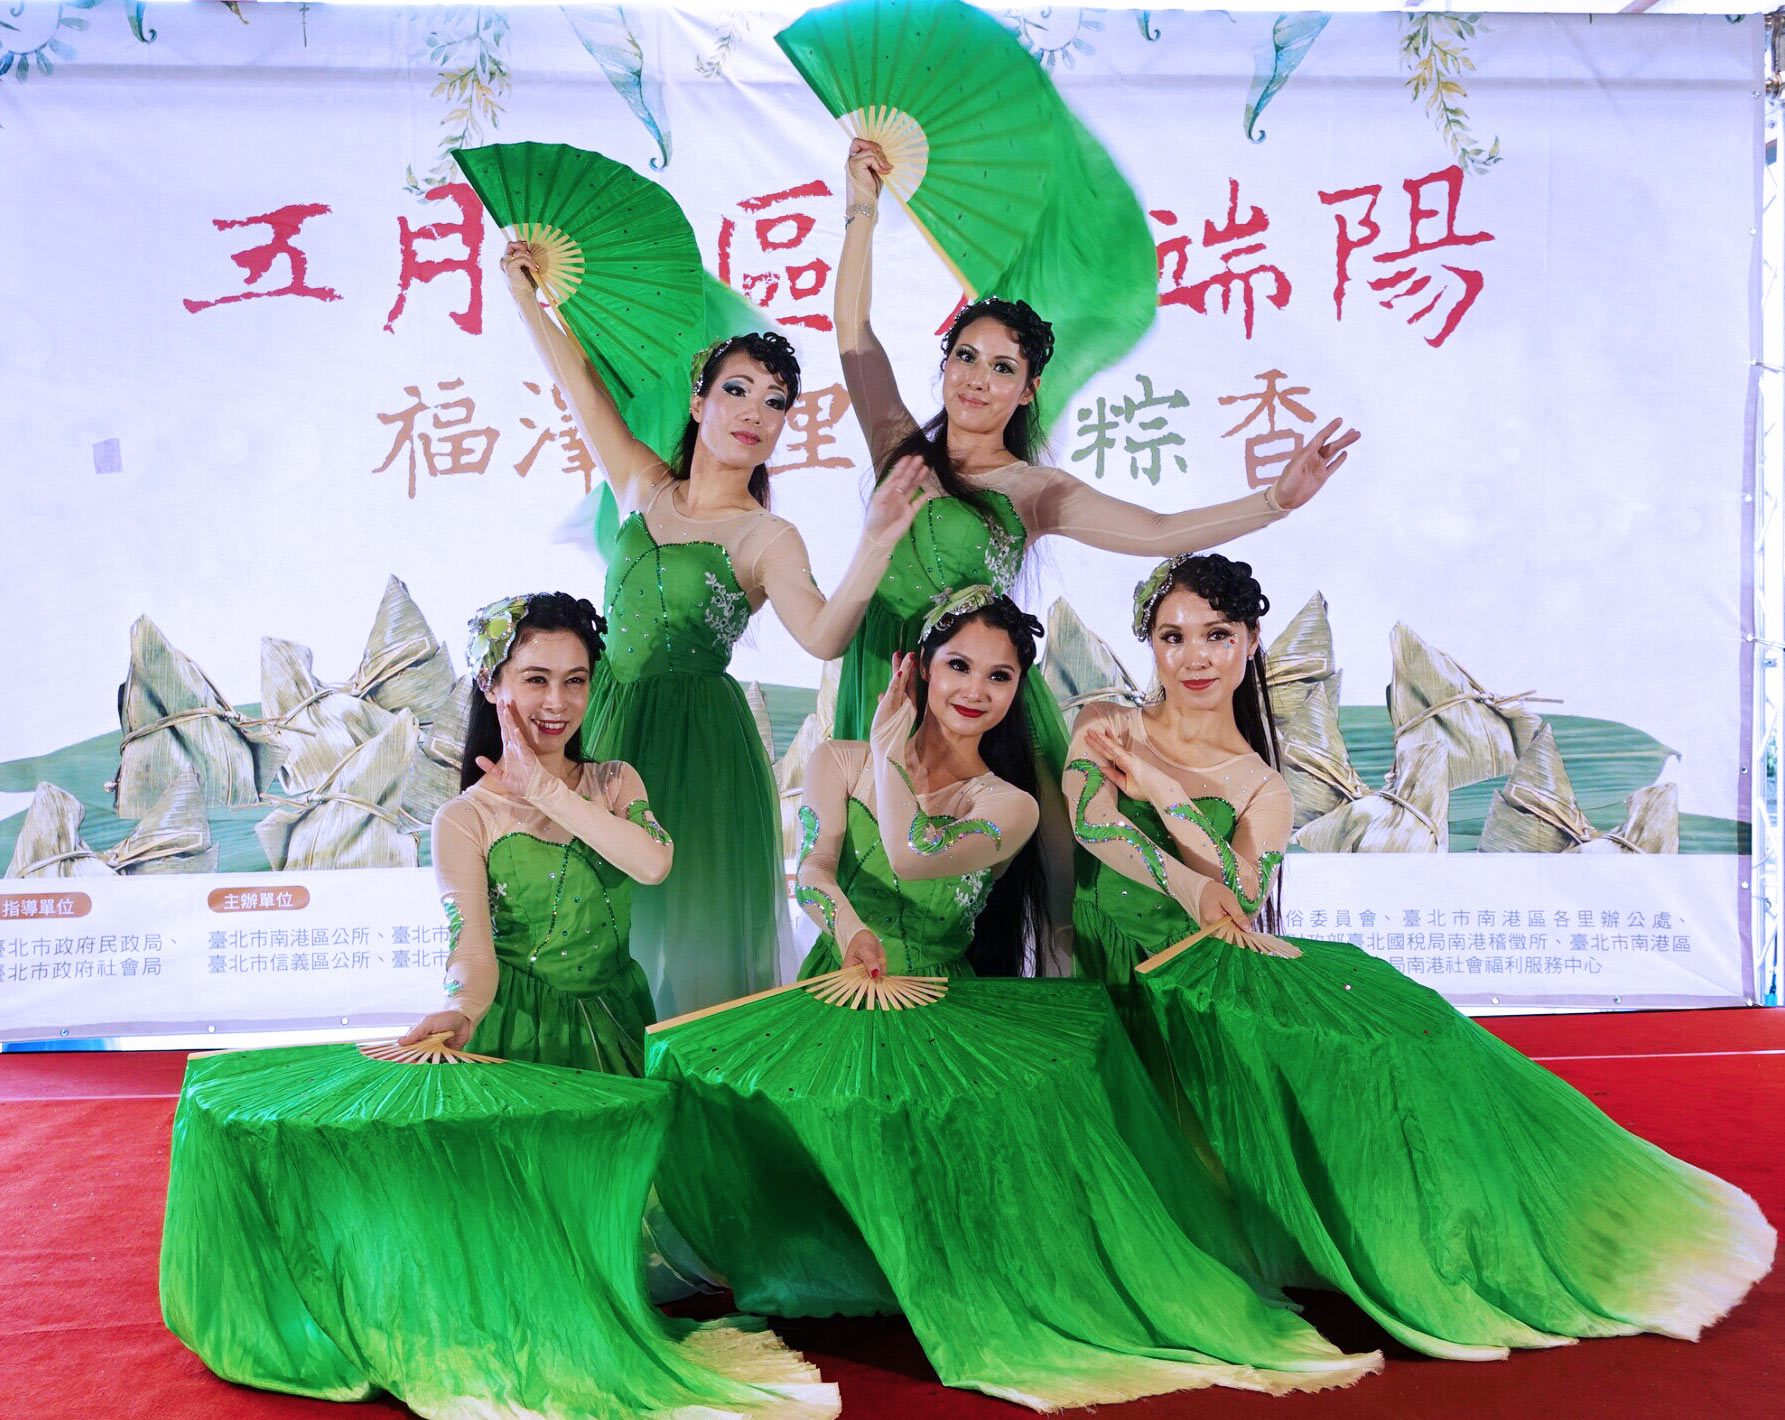 Liu Liu Dance Group performance with the theme of Dragon Boat Festival